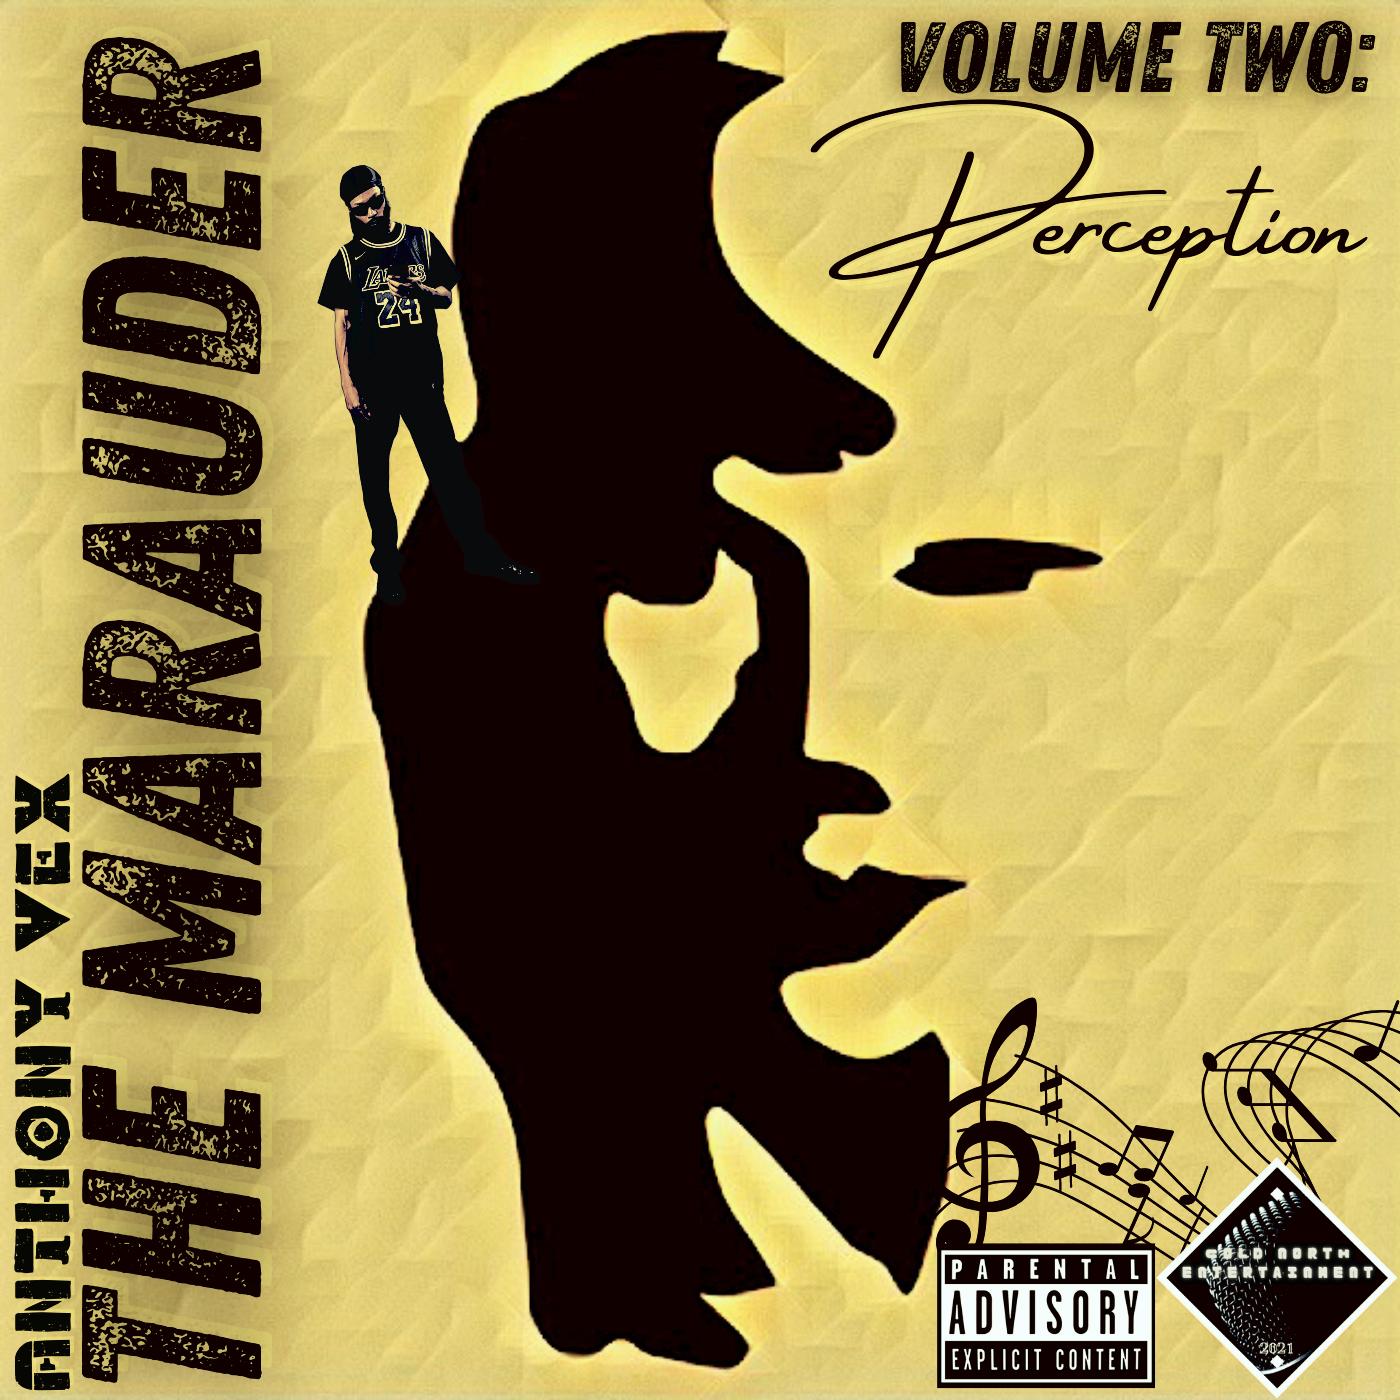 The Marauder Volume Two Perception